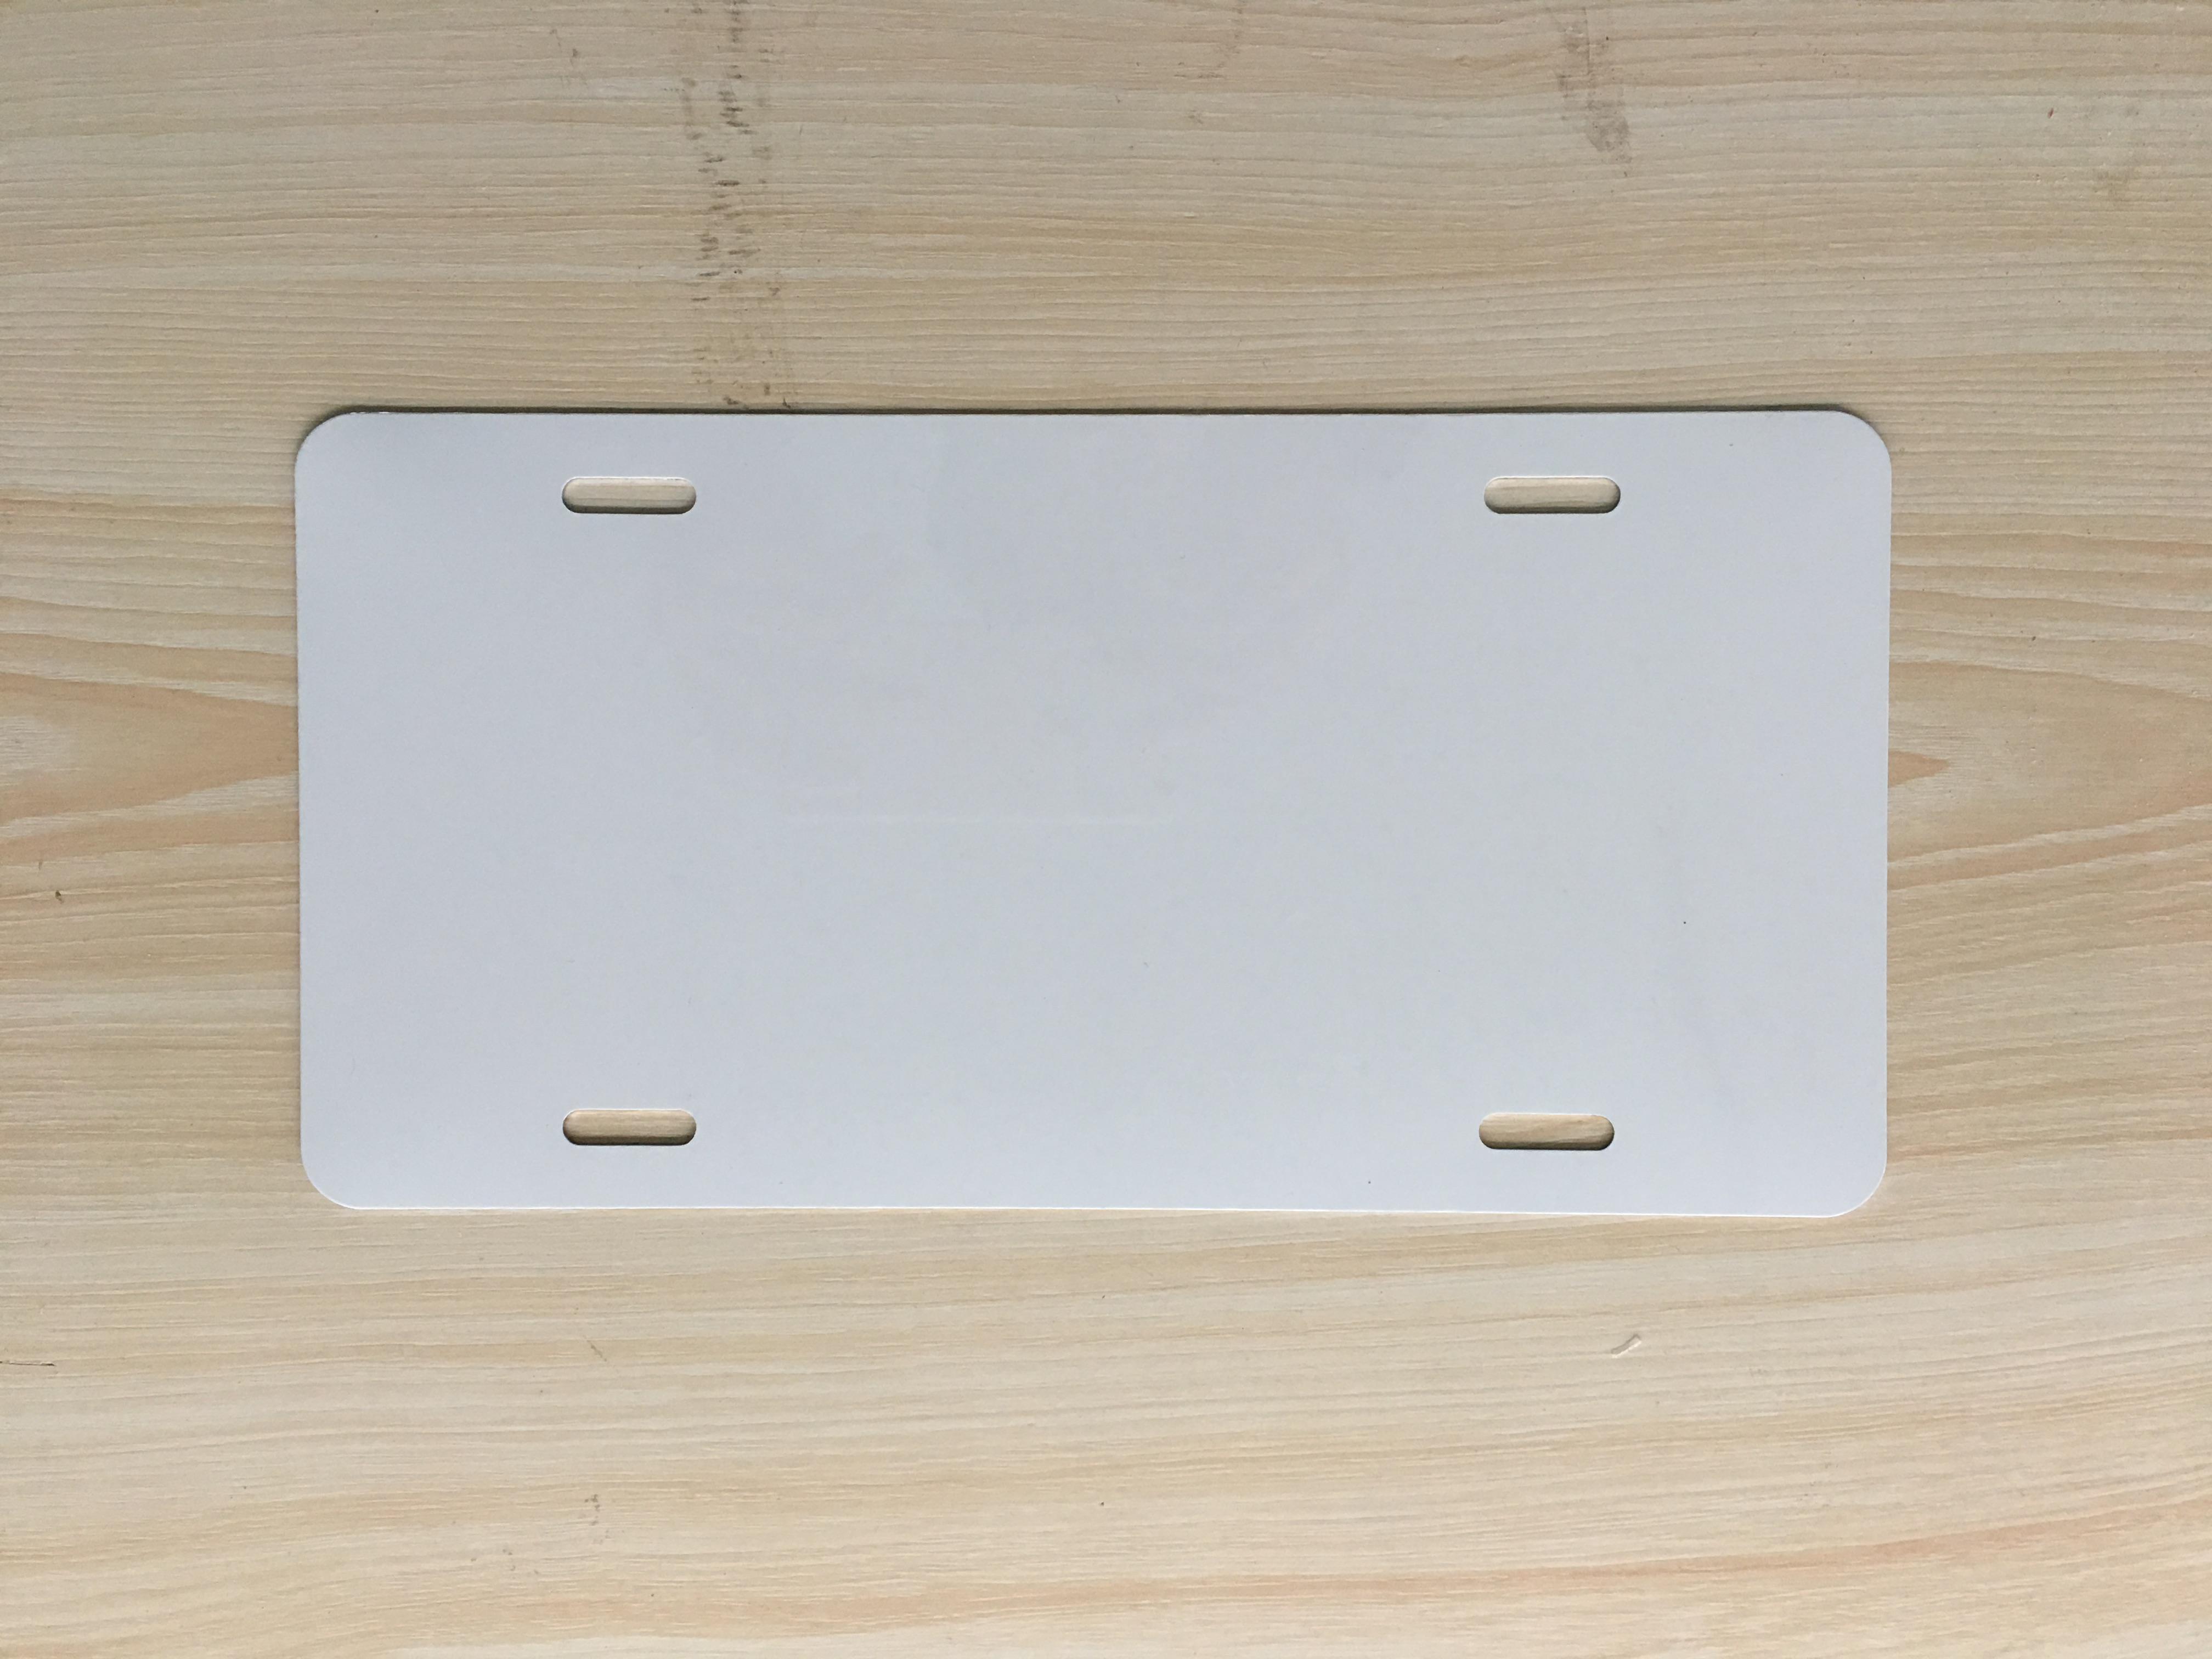 Wholesale 6'*12' Blank License Plate Blank Number Plate Sublimation Blank License Plate